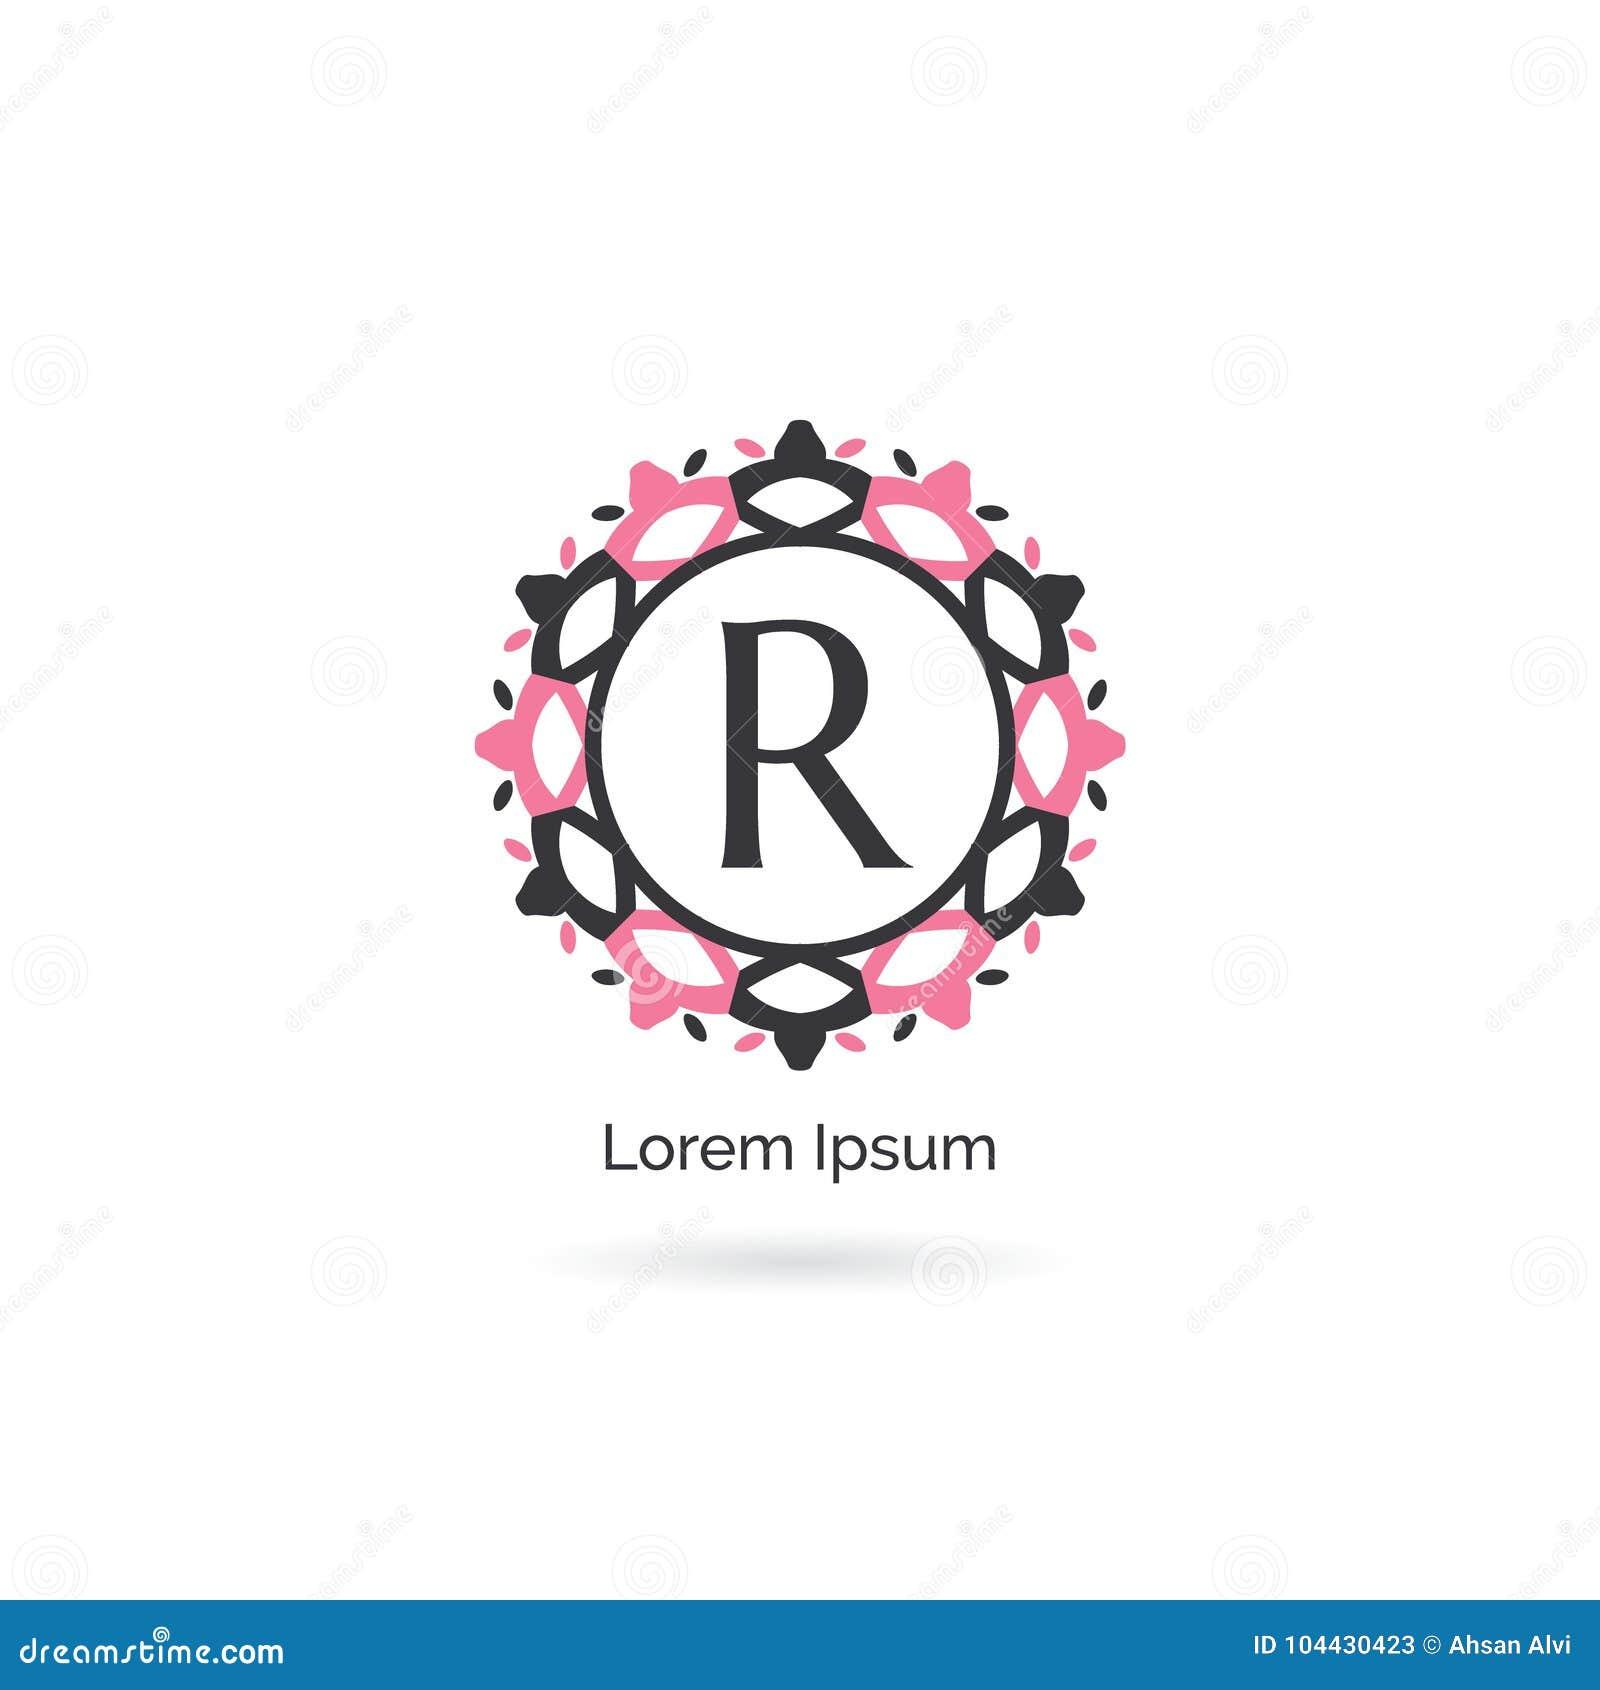 635f8250 Vintage letter R icon design. Luxury R letter logo. Vector illustration  decorative and ornamental monogram. Royalty-Free Illustration